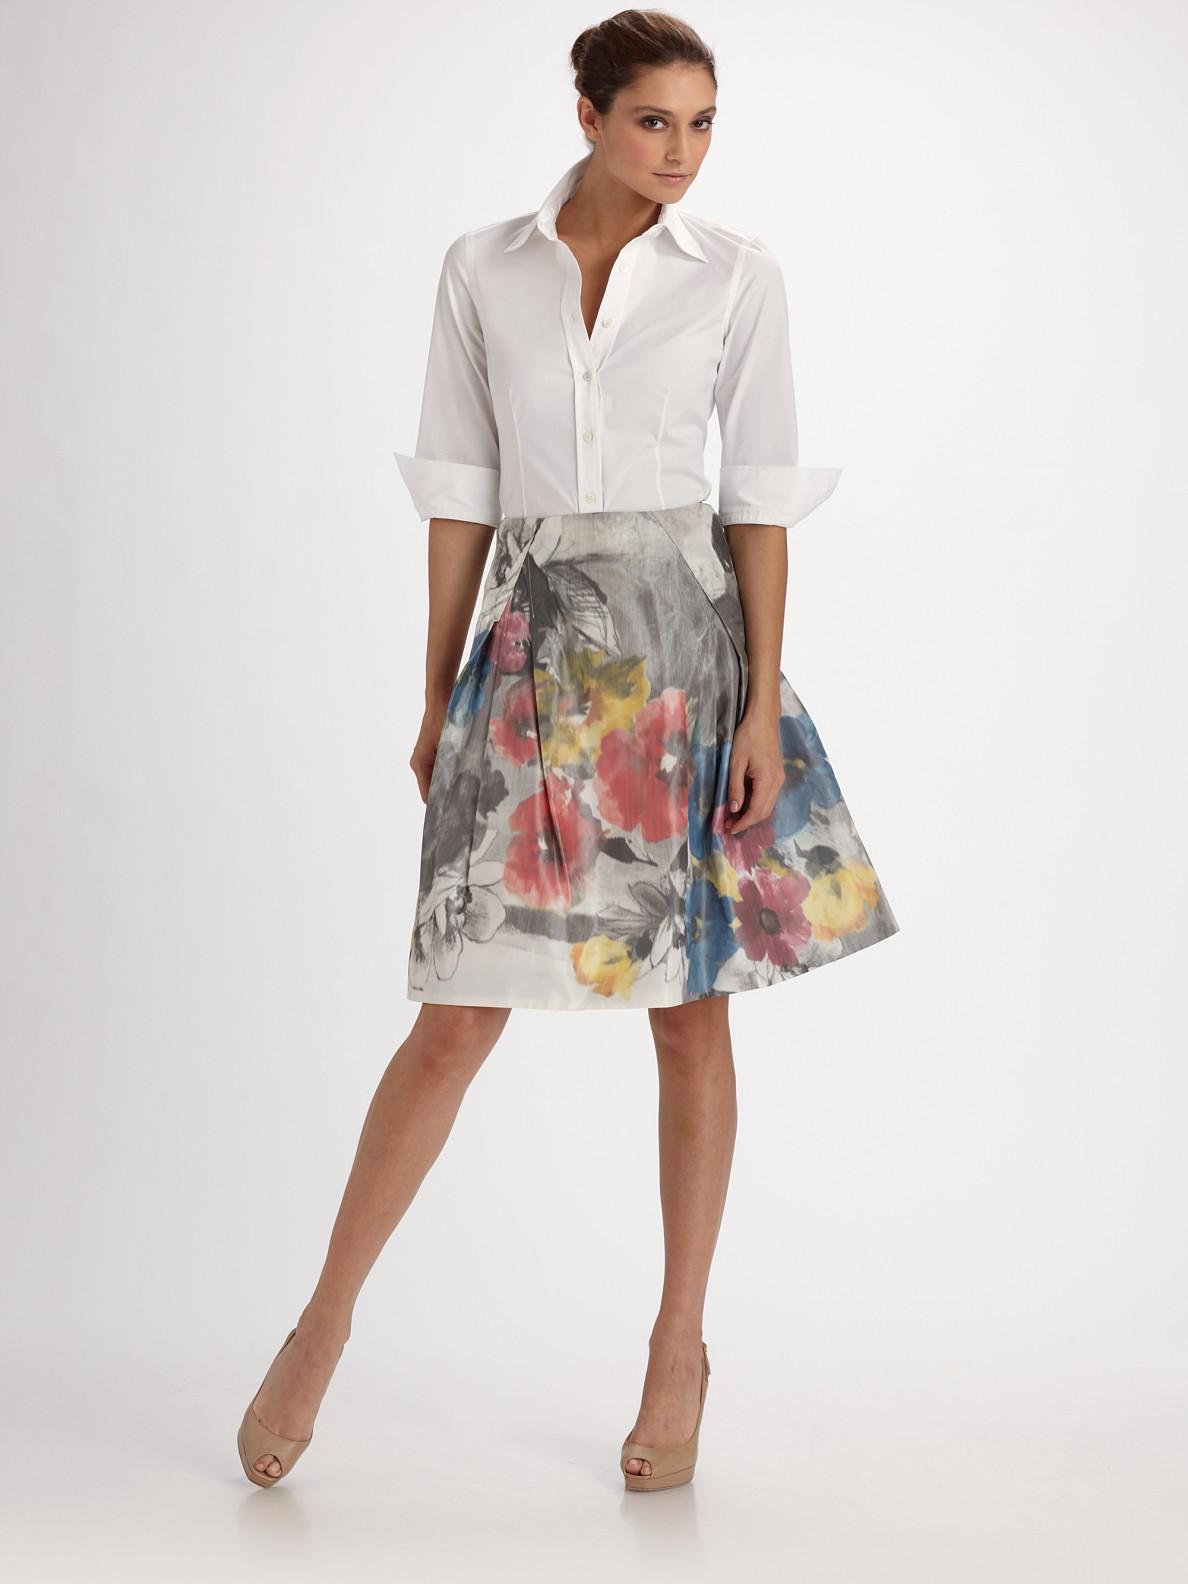 Lyst Carolina Herrera Floral Print Taffeta Party Skirt